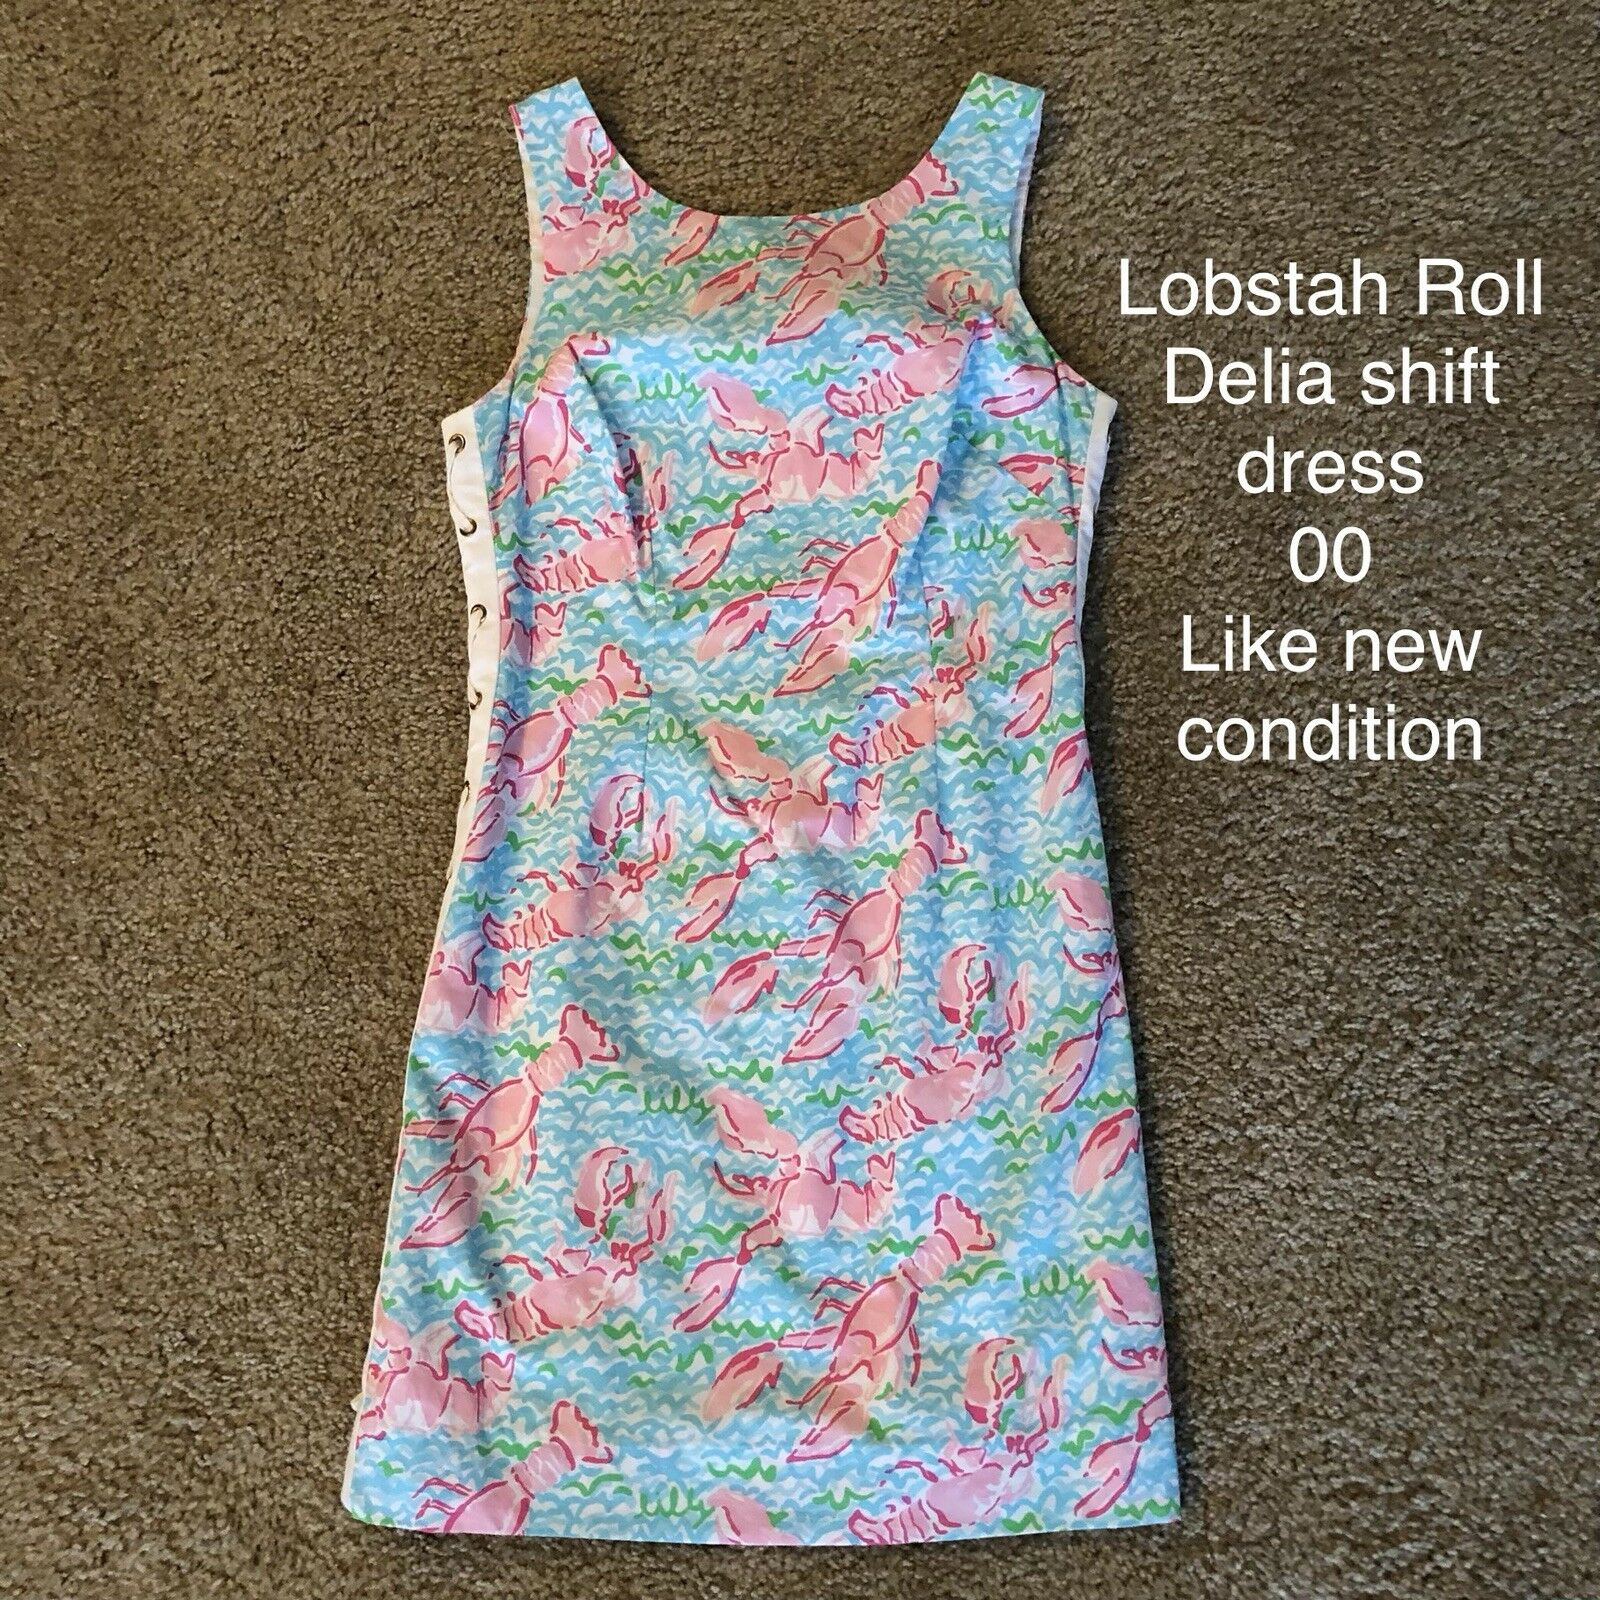 Lilly Pulitzer Lobstah Roll Shift Dress 00